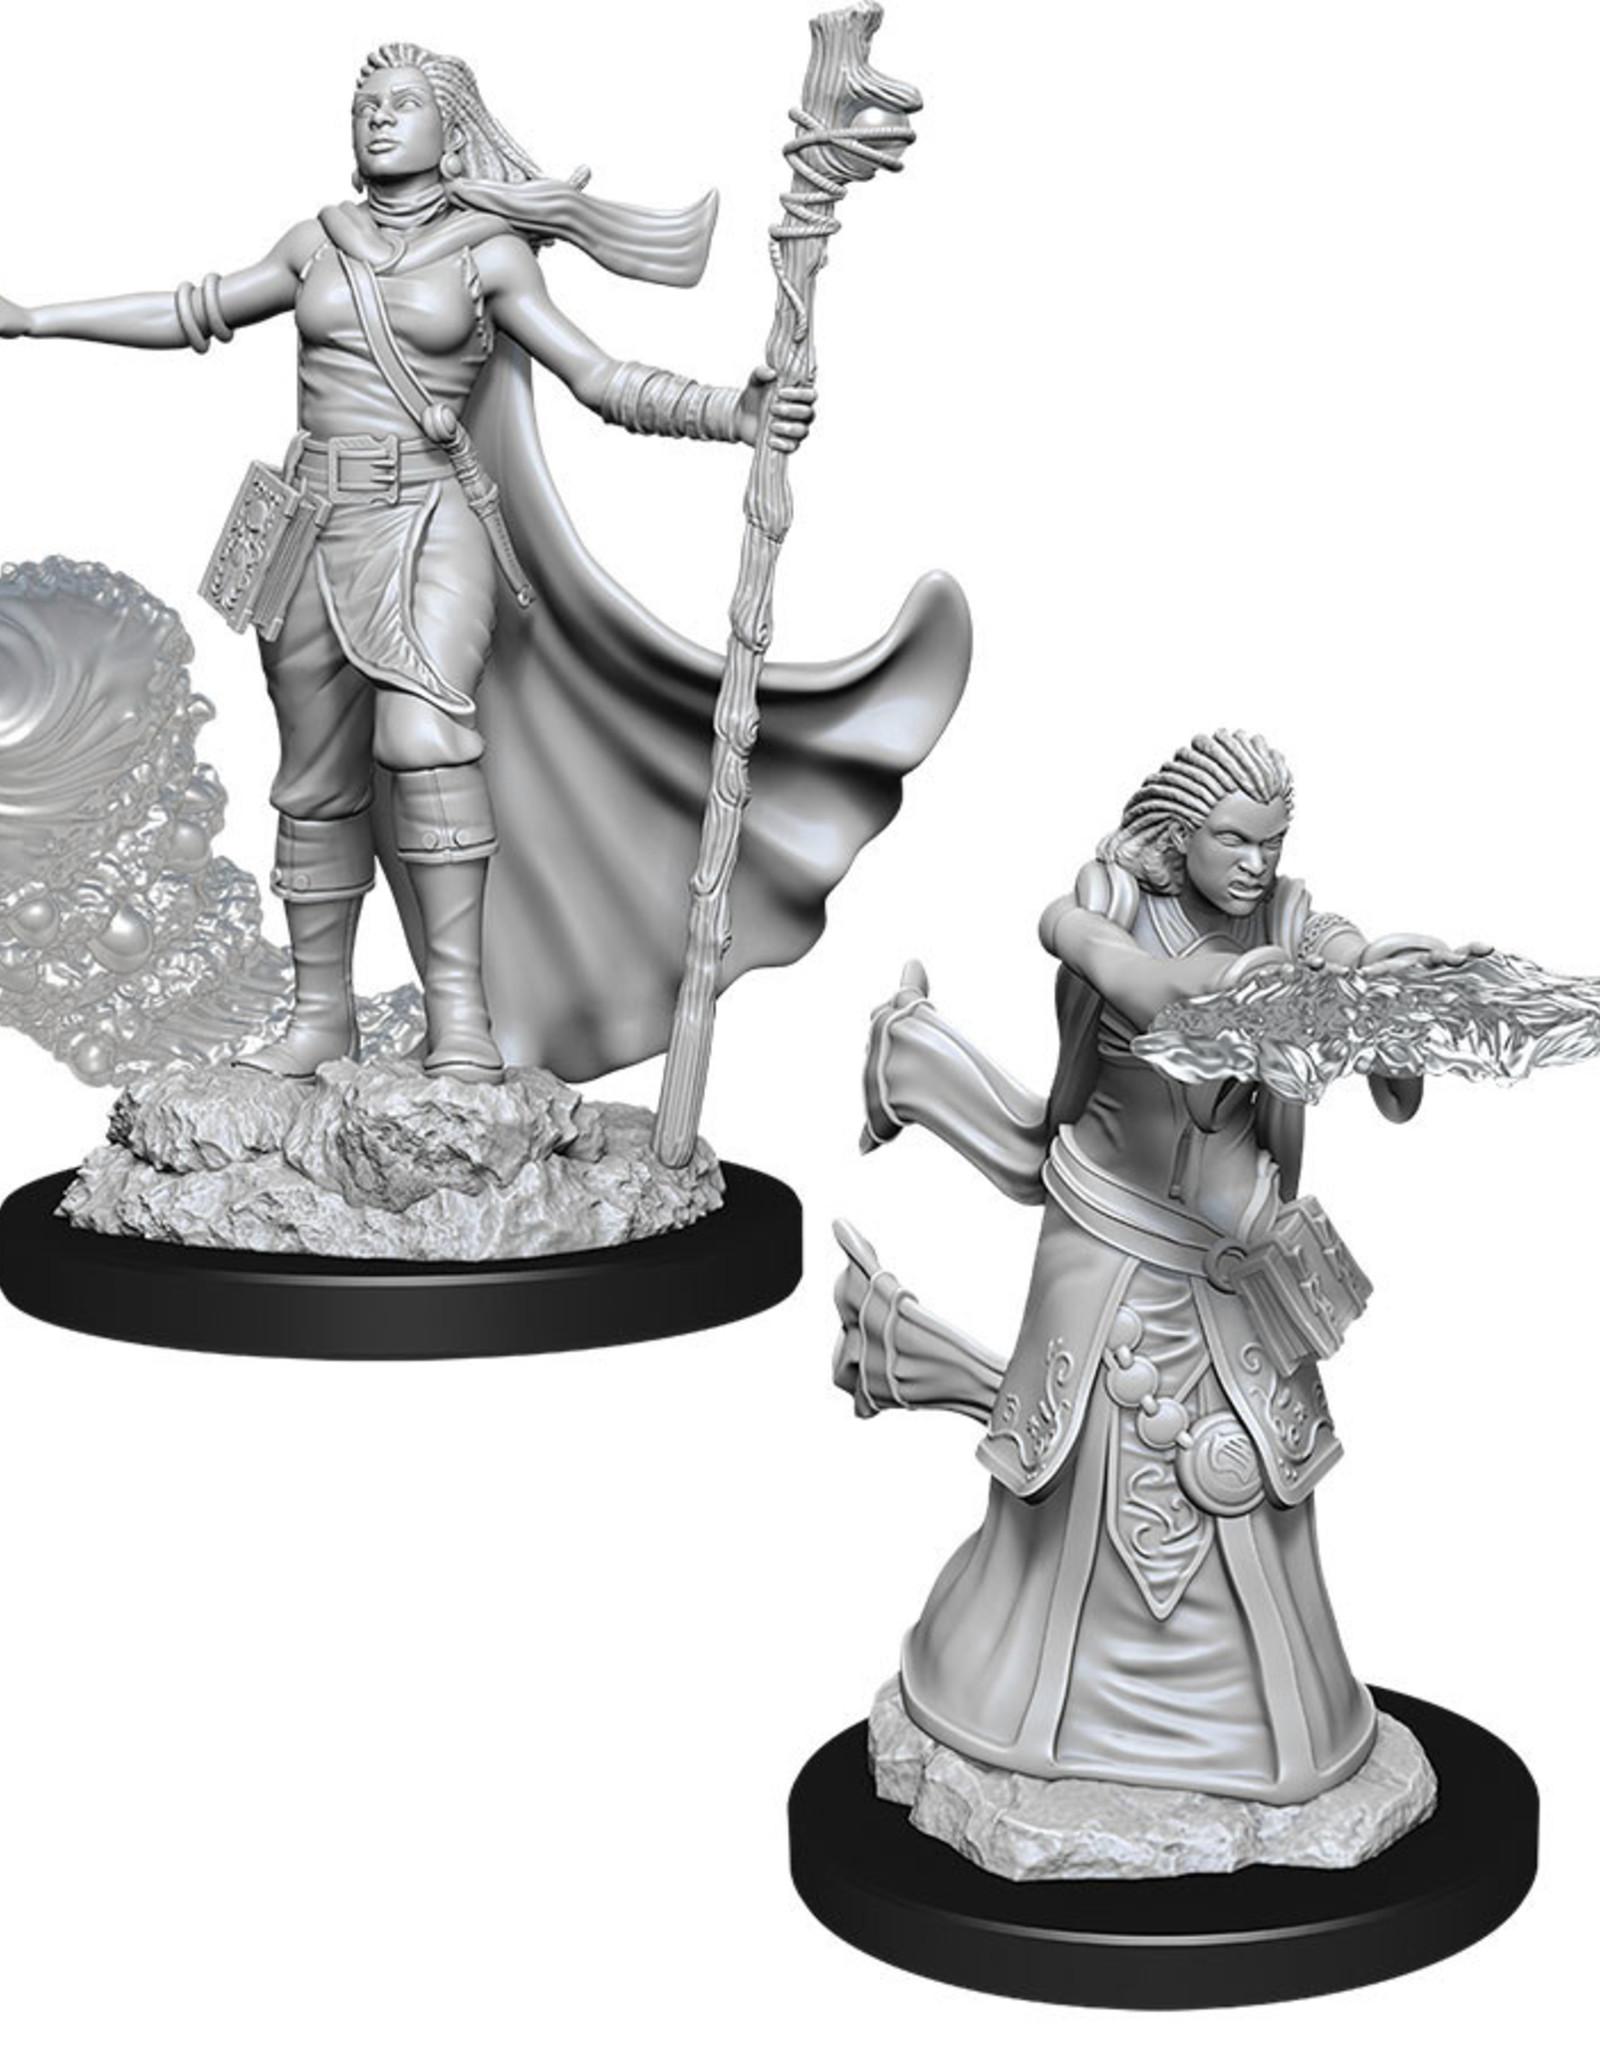 WizKids Dungeons & Dragons Nolzur's Marvelous Miniatures: Female Human Wizard